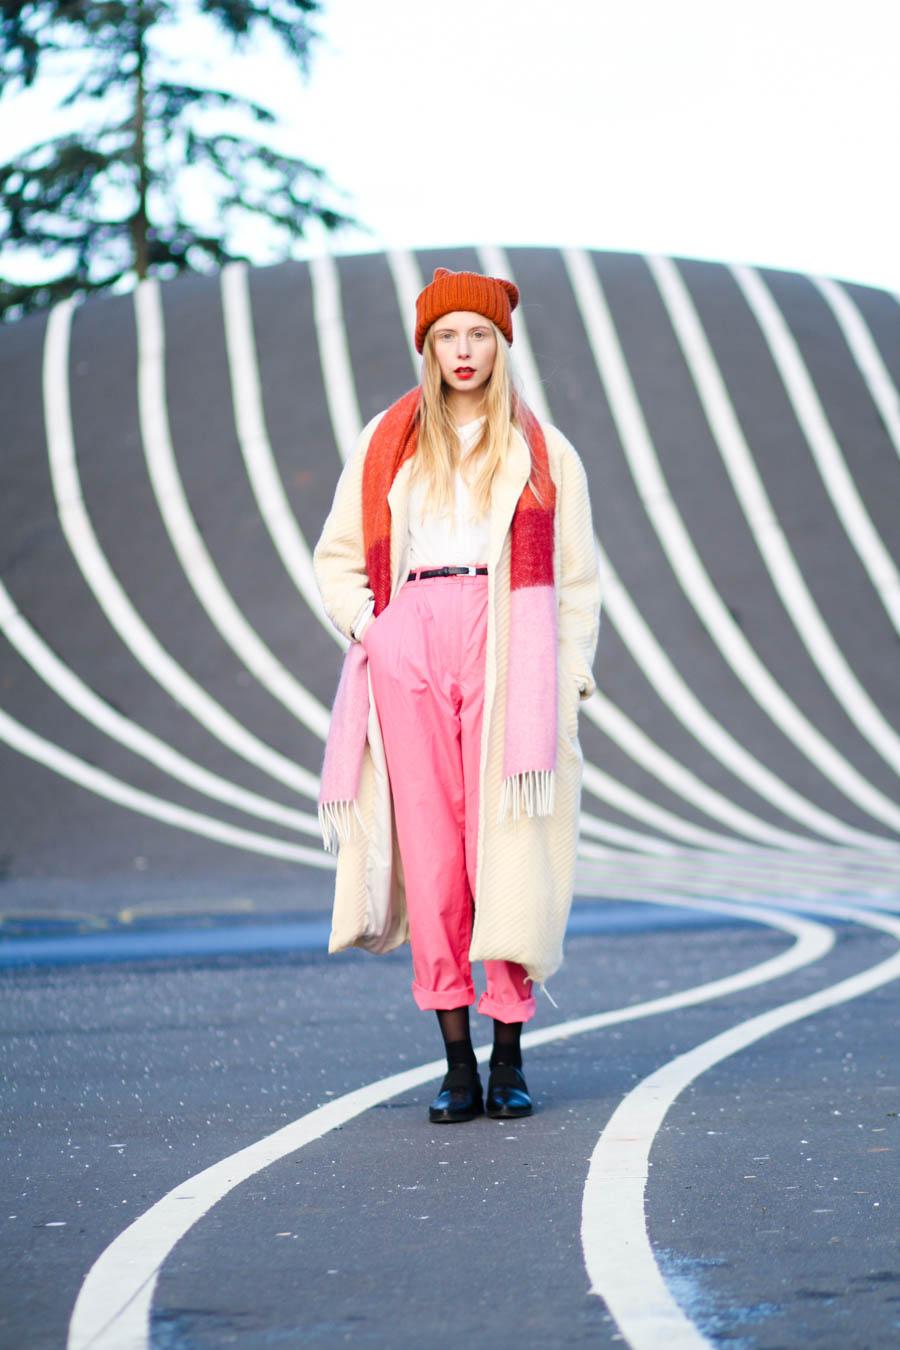 outfit january nemesis babe marie jensen danish blogger -3